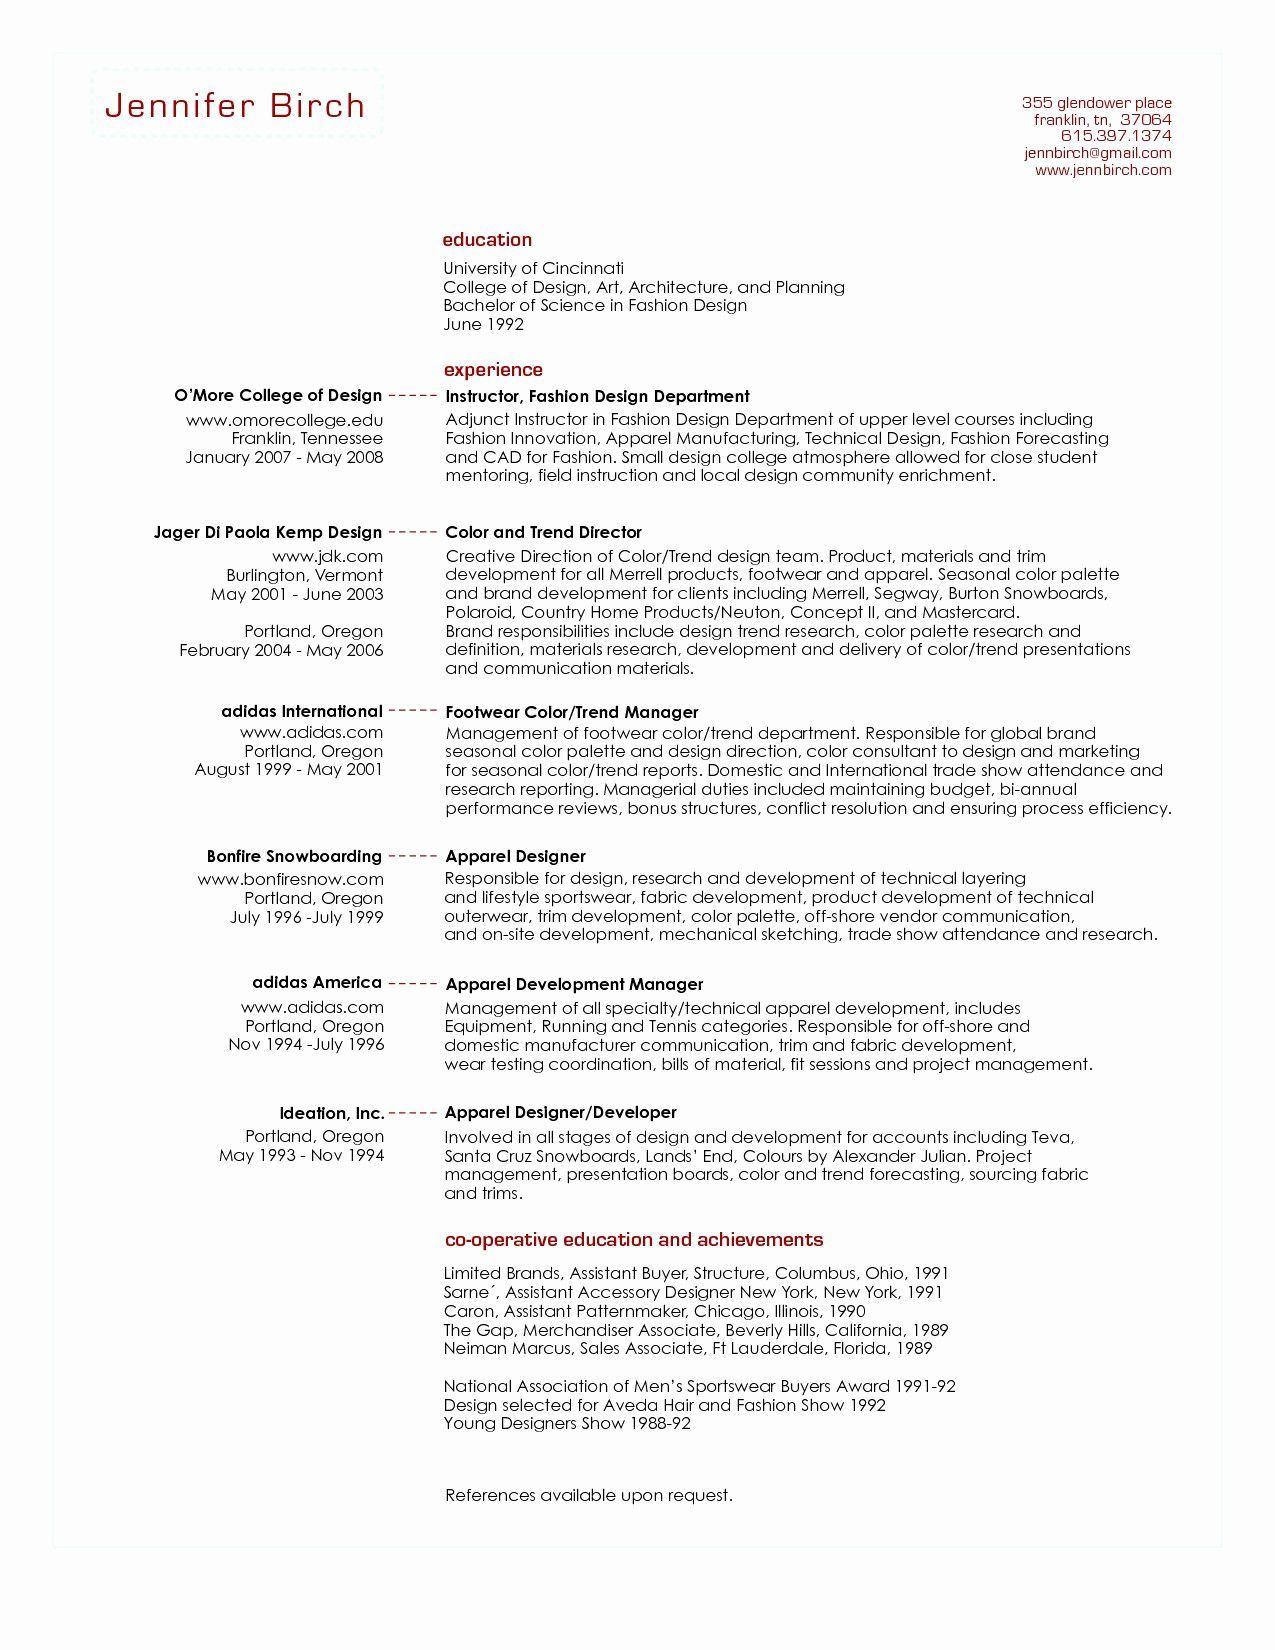 Resume Templates Jose Rizal Resume Resumetemplates Rizal